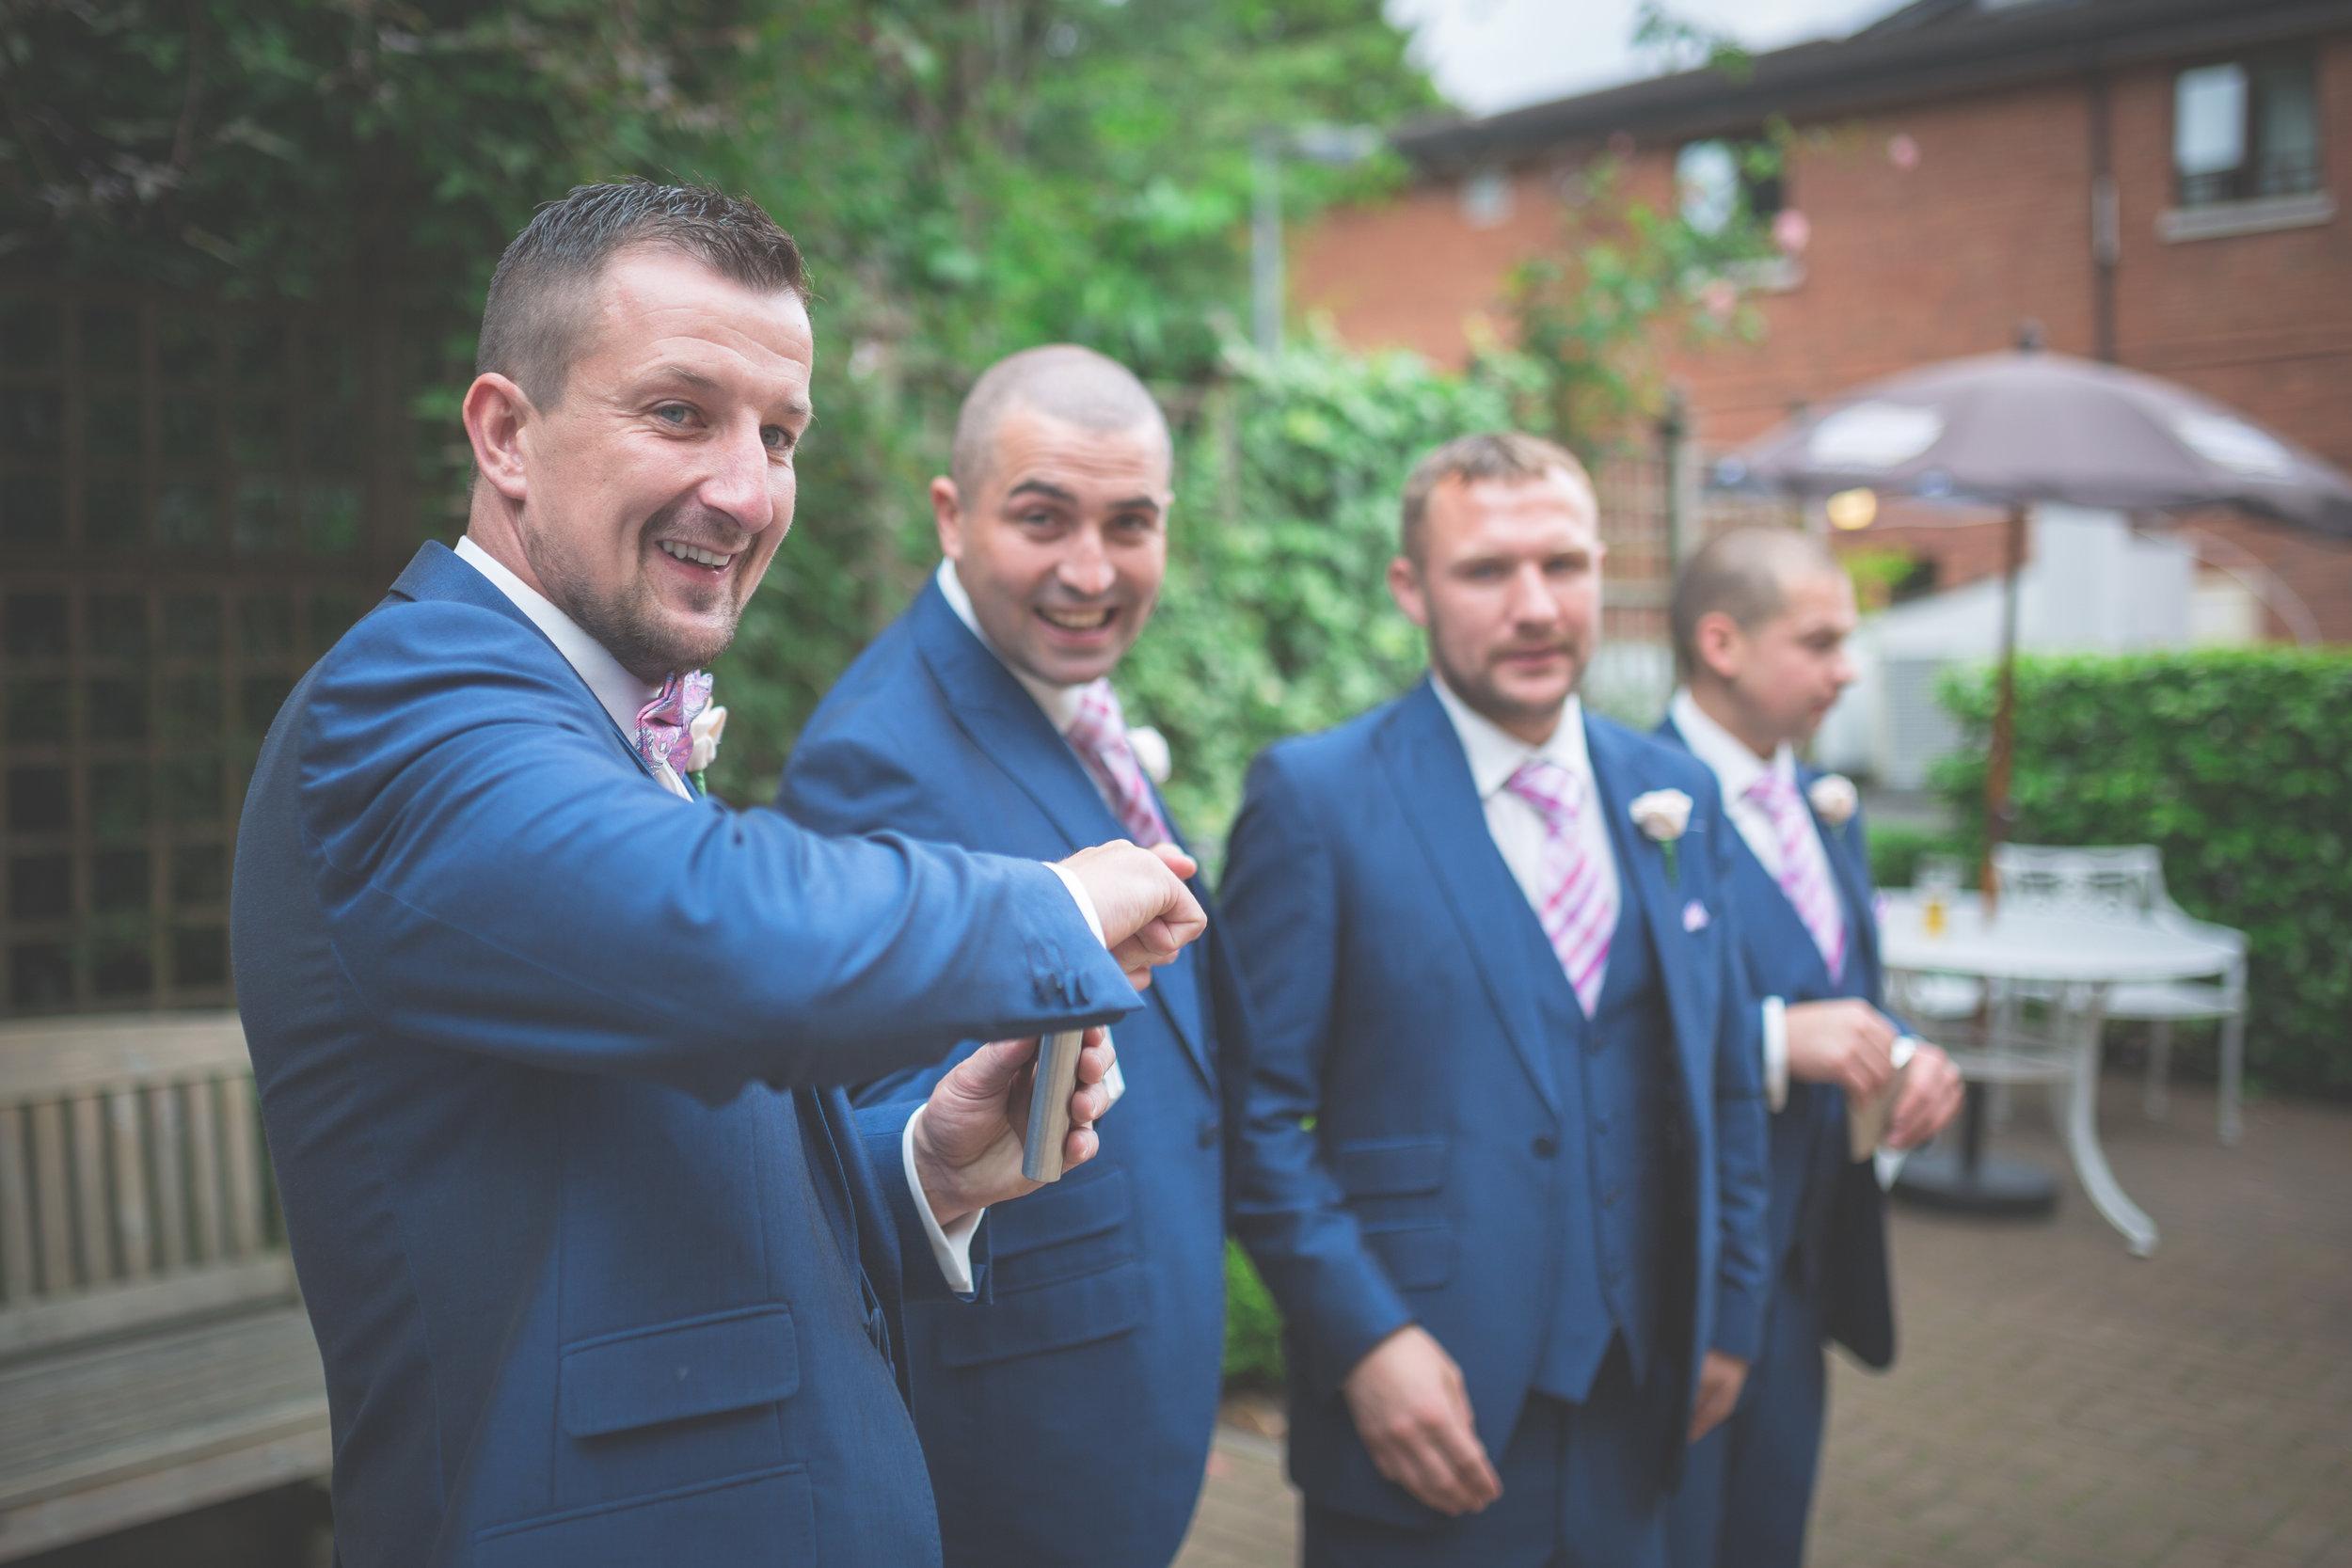 Antoinette & Stephen - Portraits | Brian McEwan Photography | Wedding Photographer Northern Ireland 74.jpg